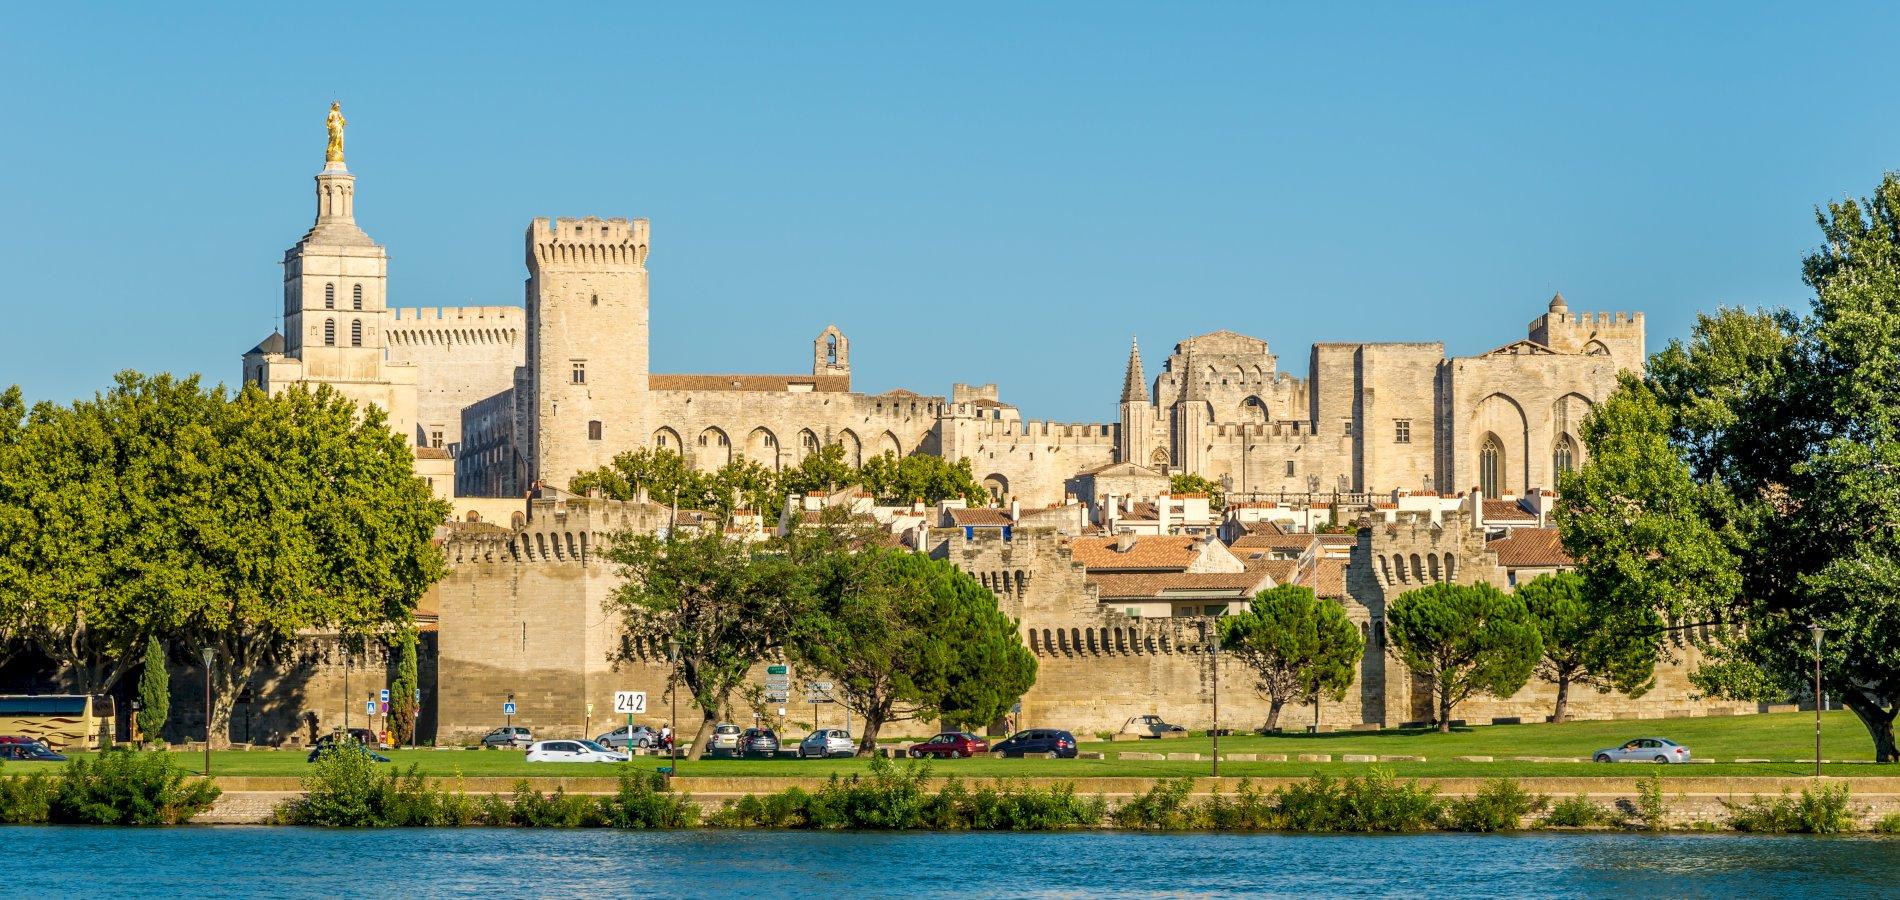 Ophorus Tours - Avignon Visit & Provence Wine Tour Private Shore Excursion from Marseille